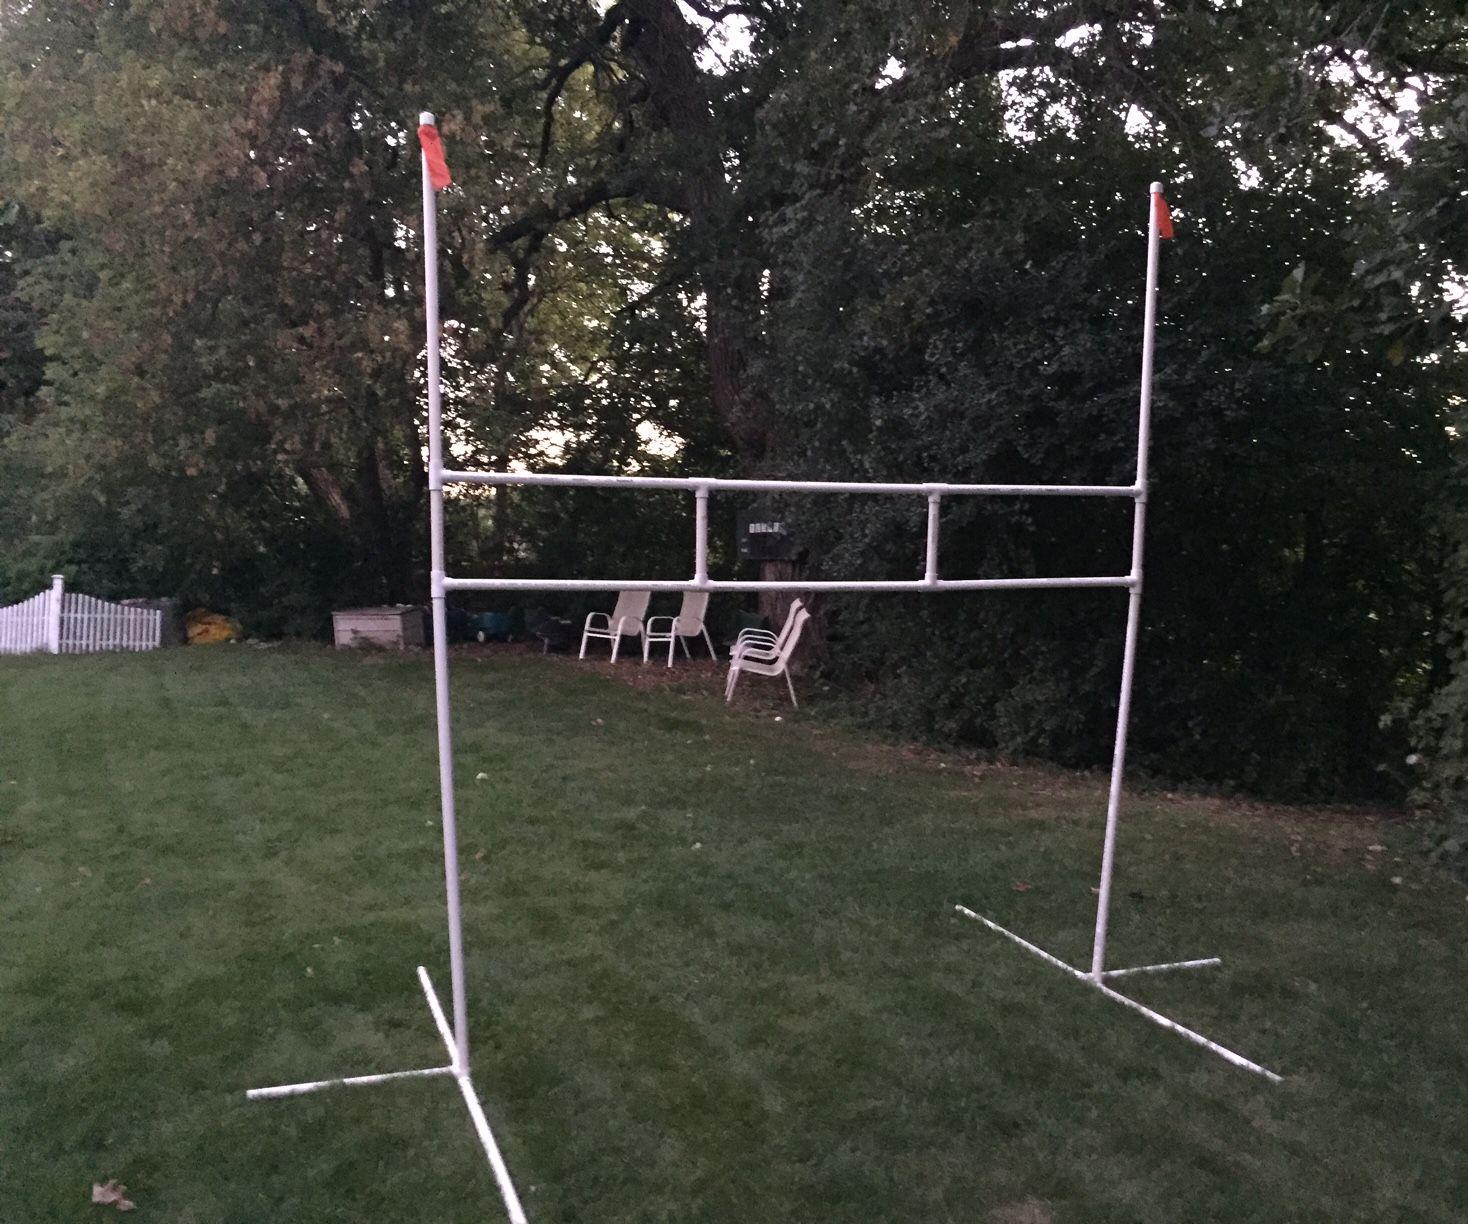 PVC goalposts - easy project